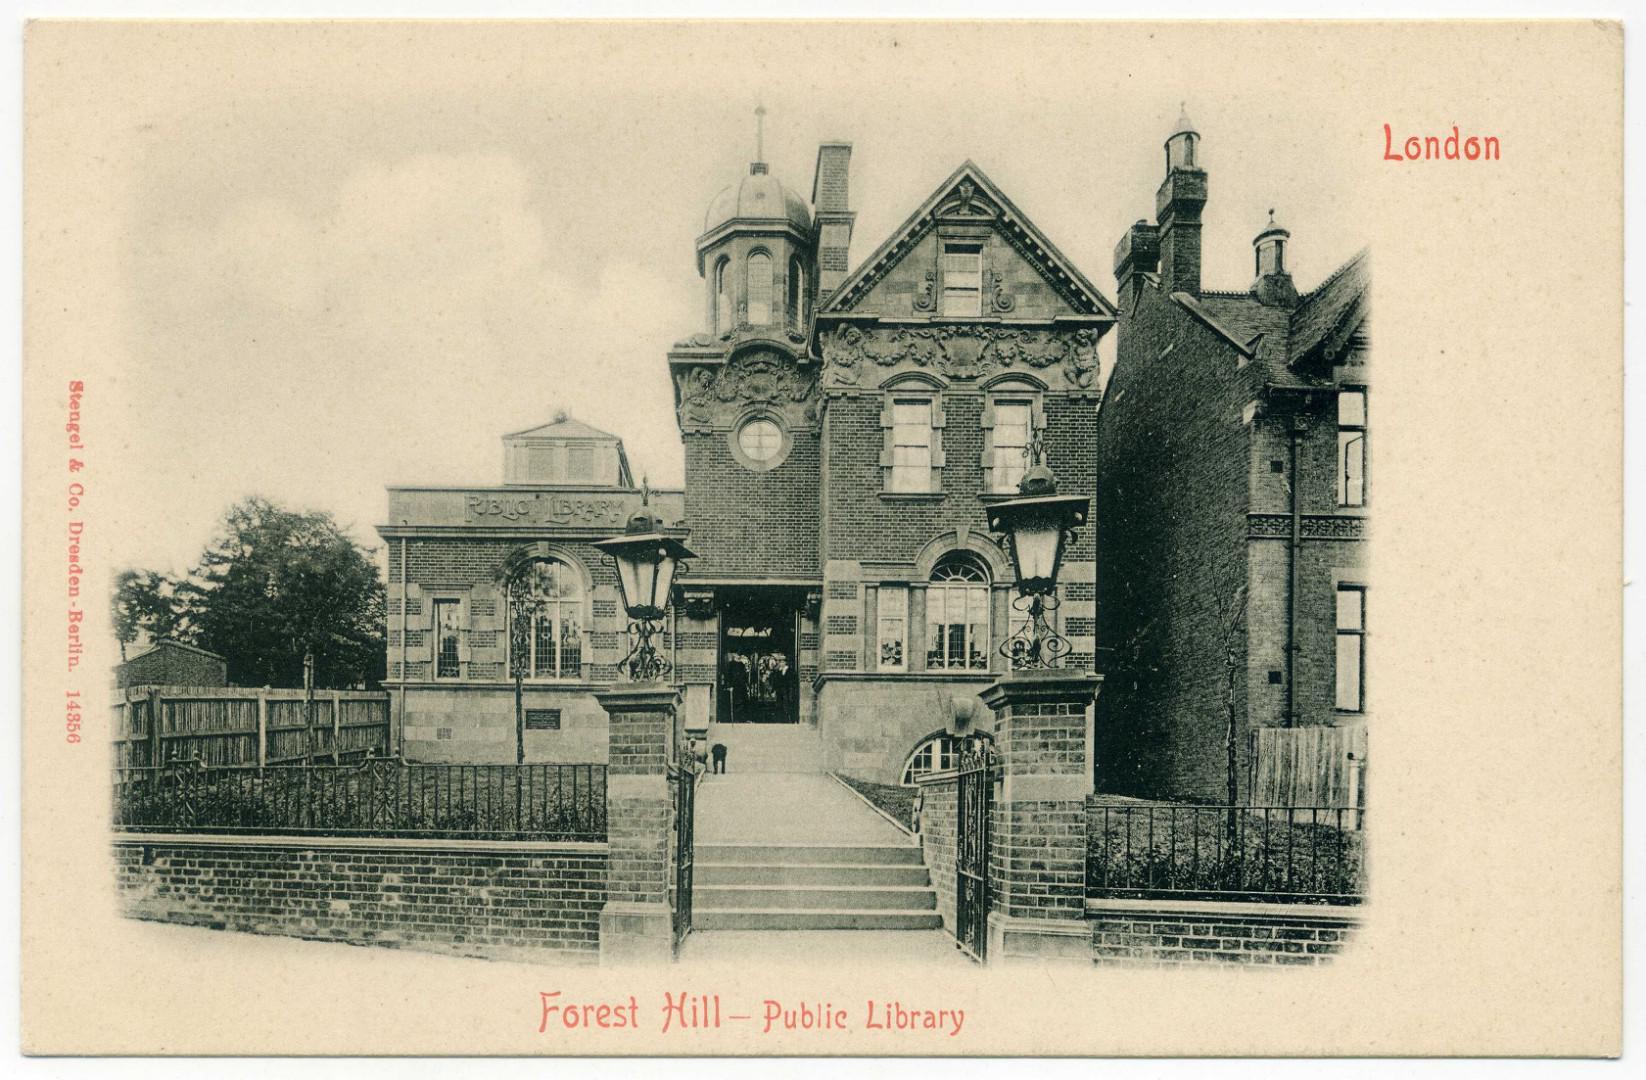 London Lewisham Forest Hill Public Library